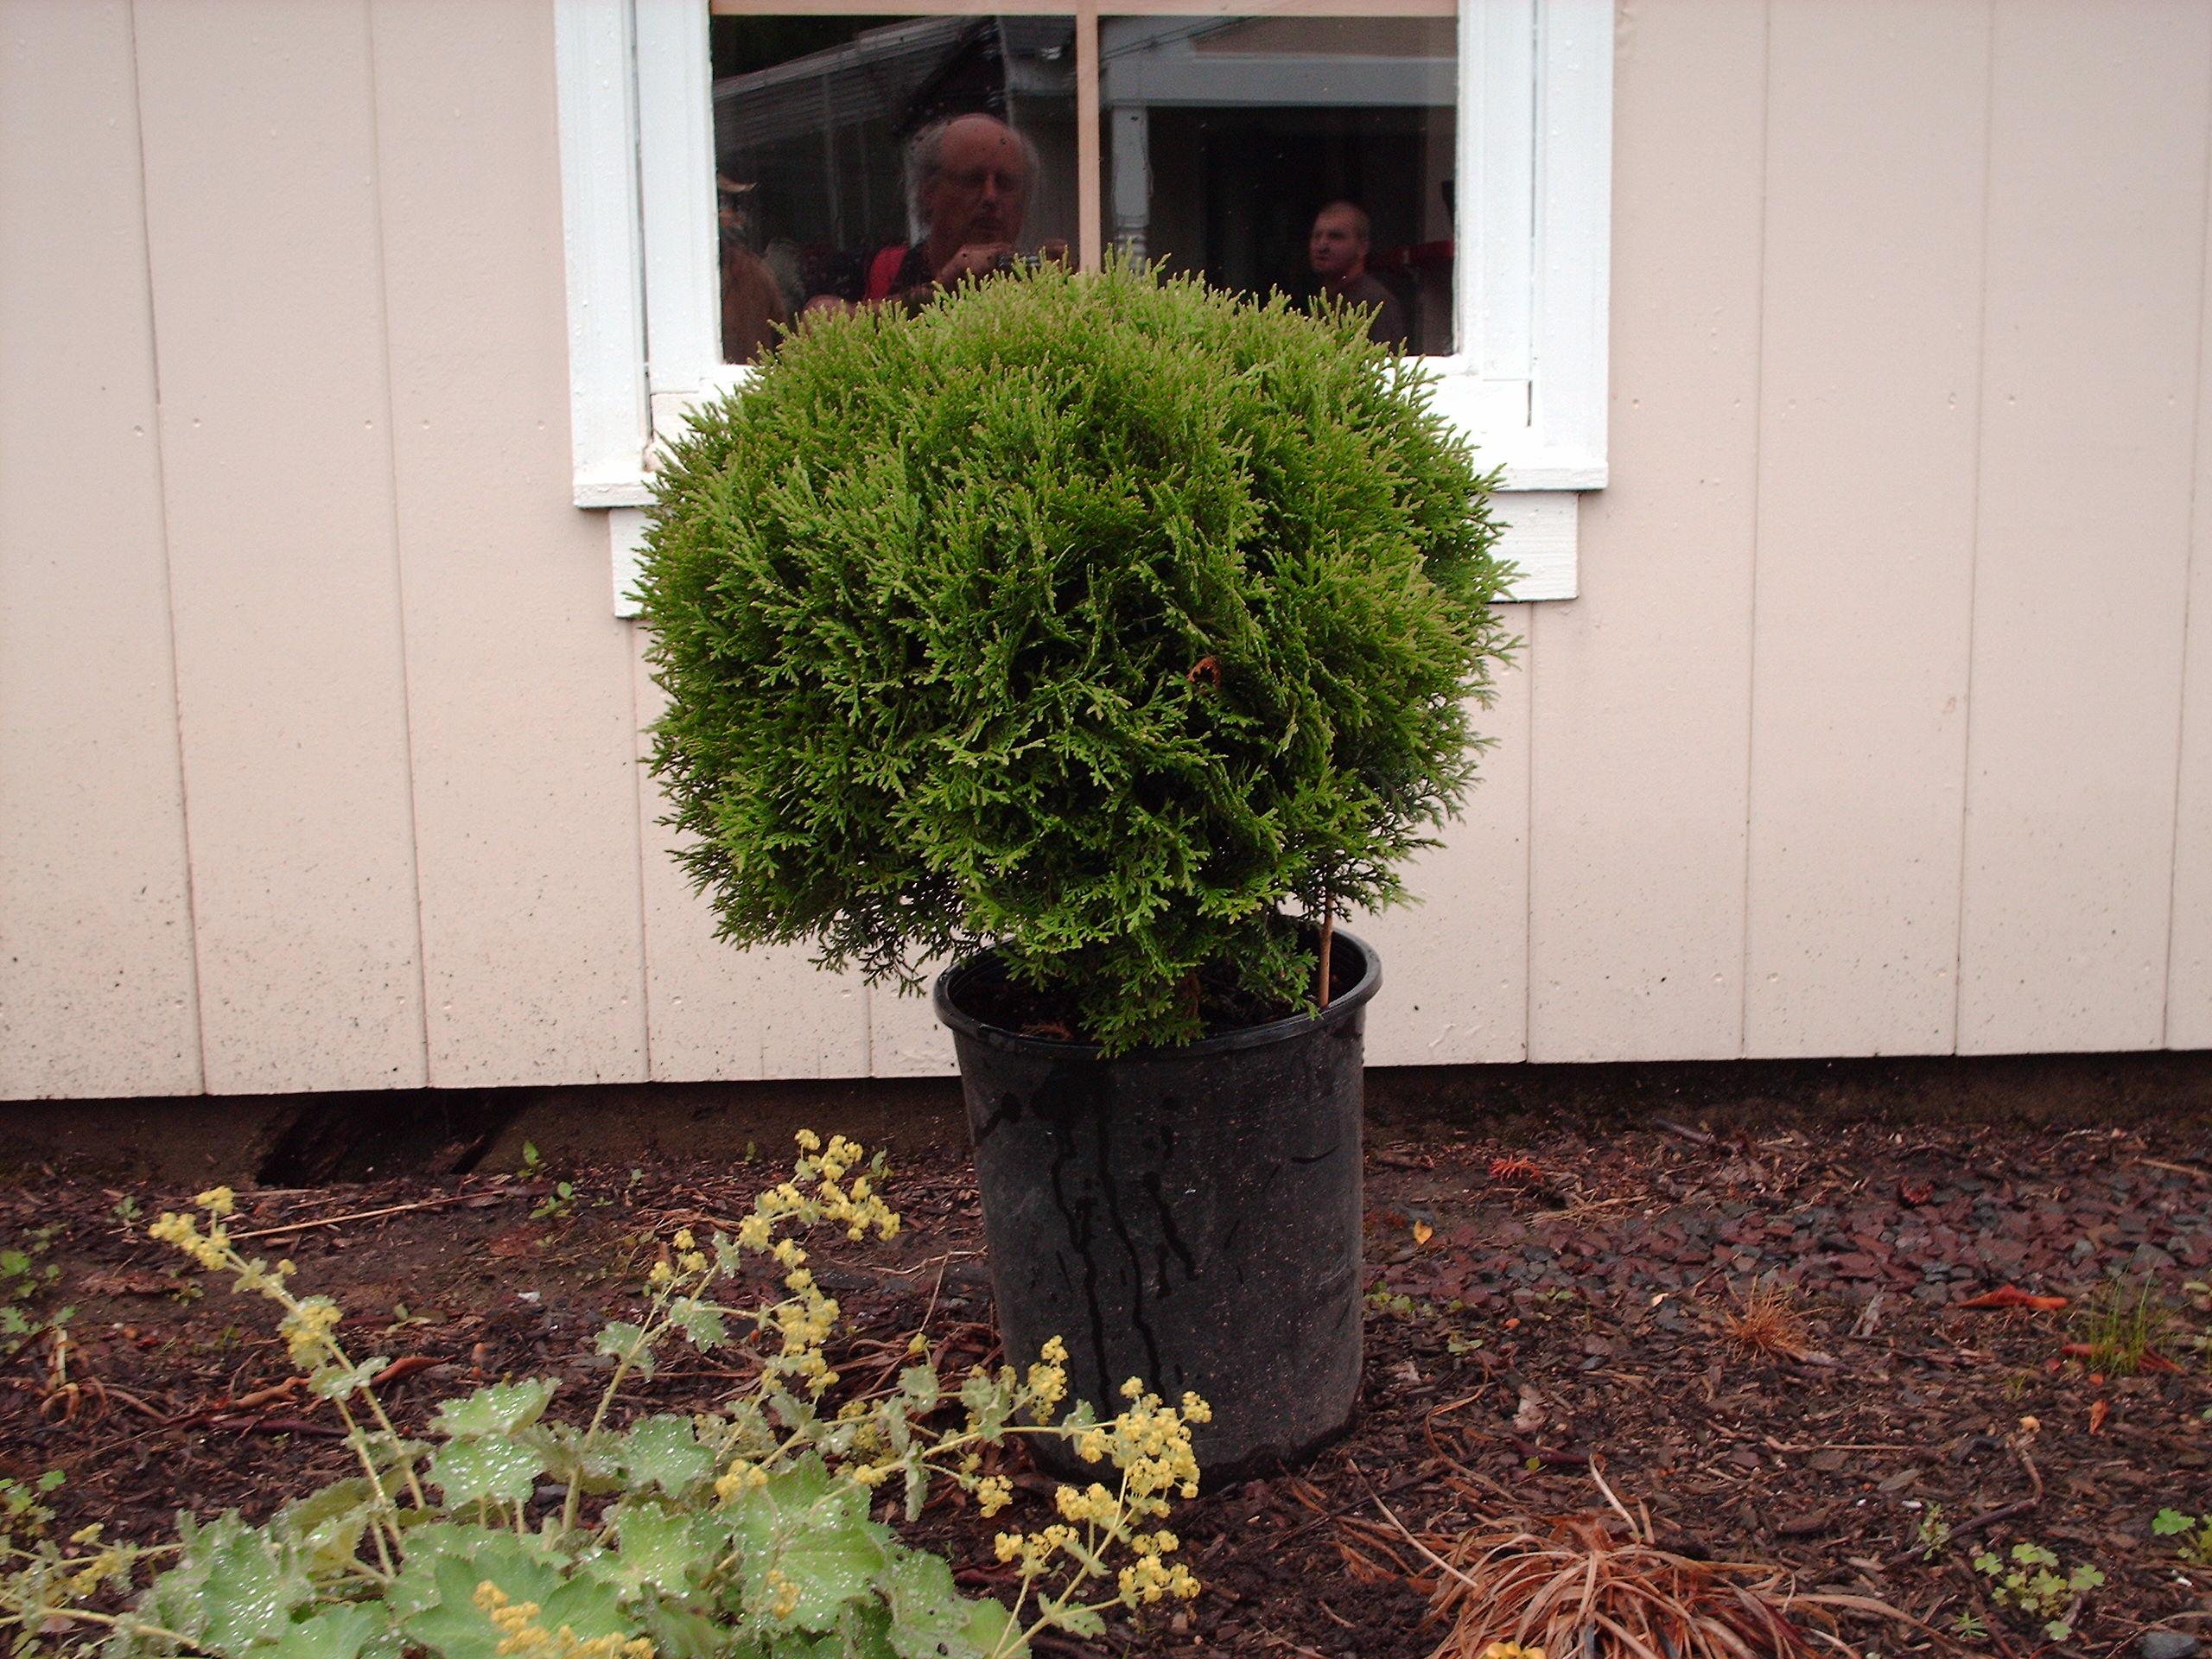 Our Tom Thumb Arborvitae